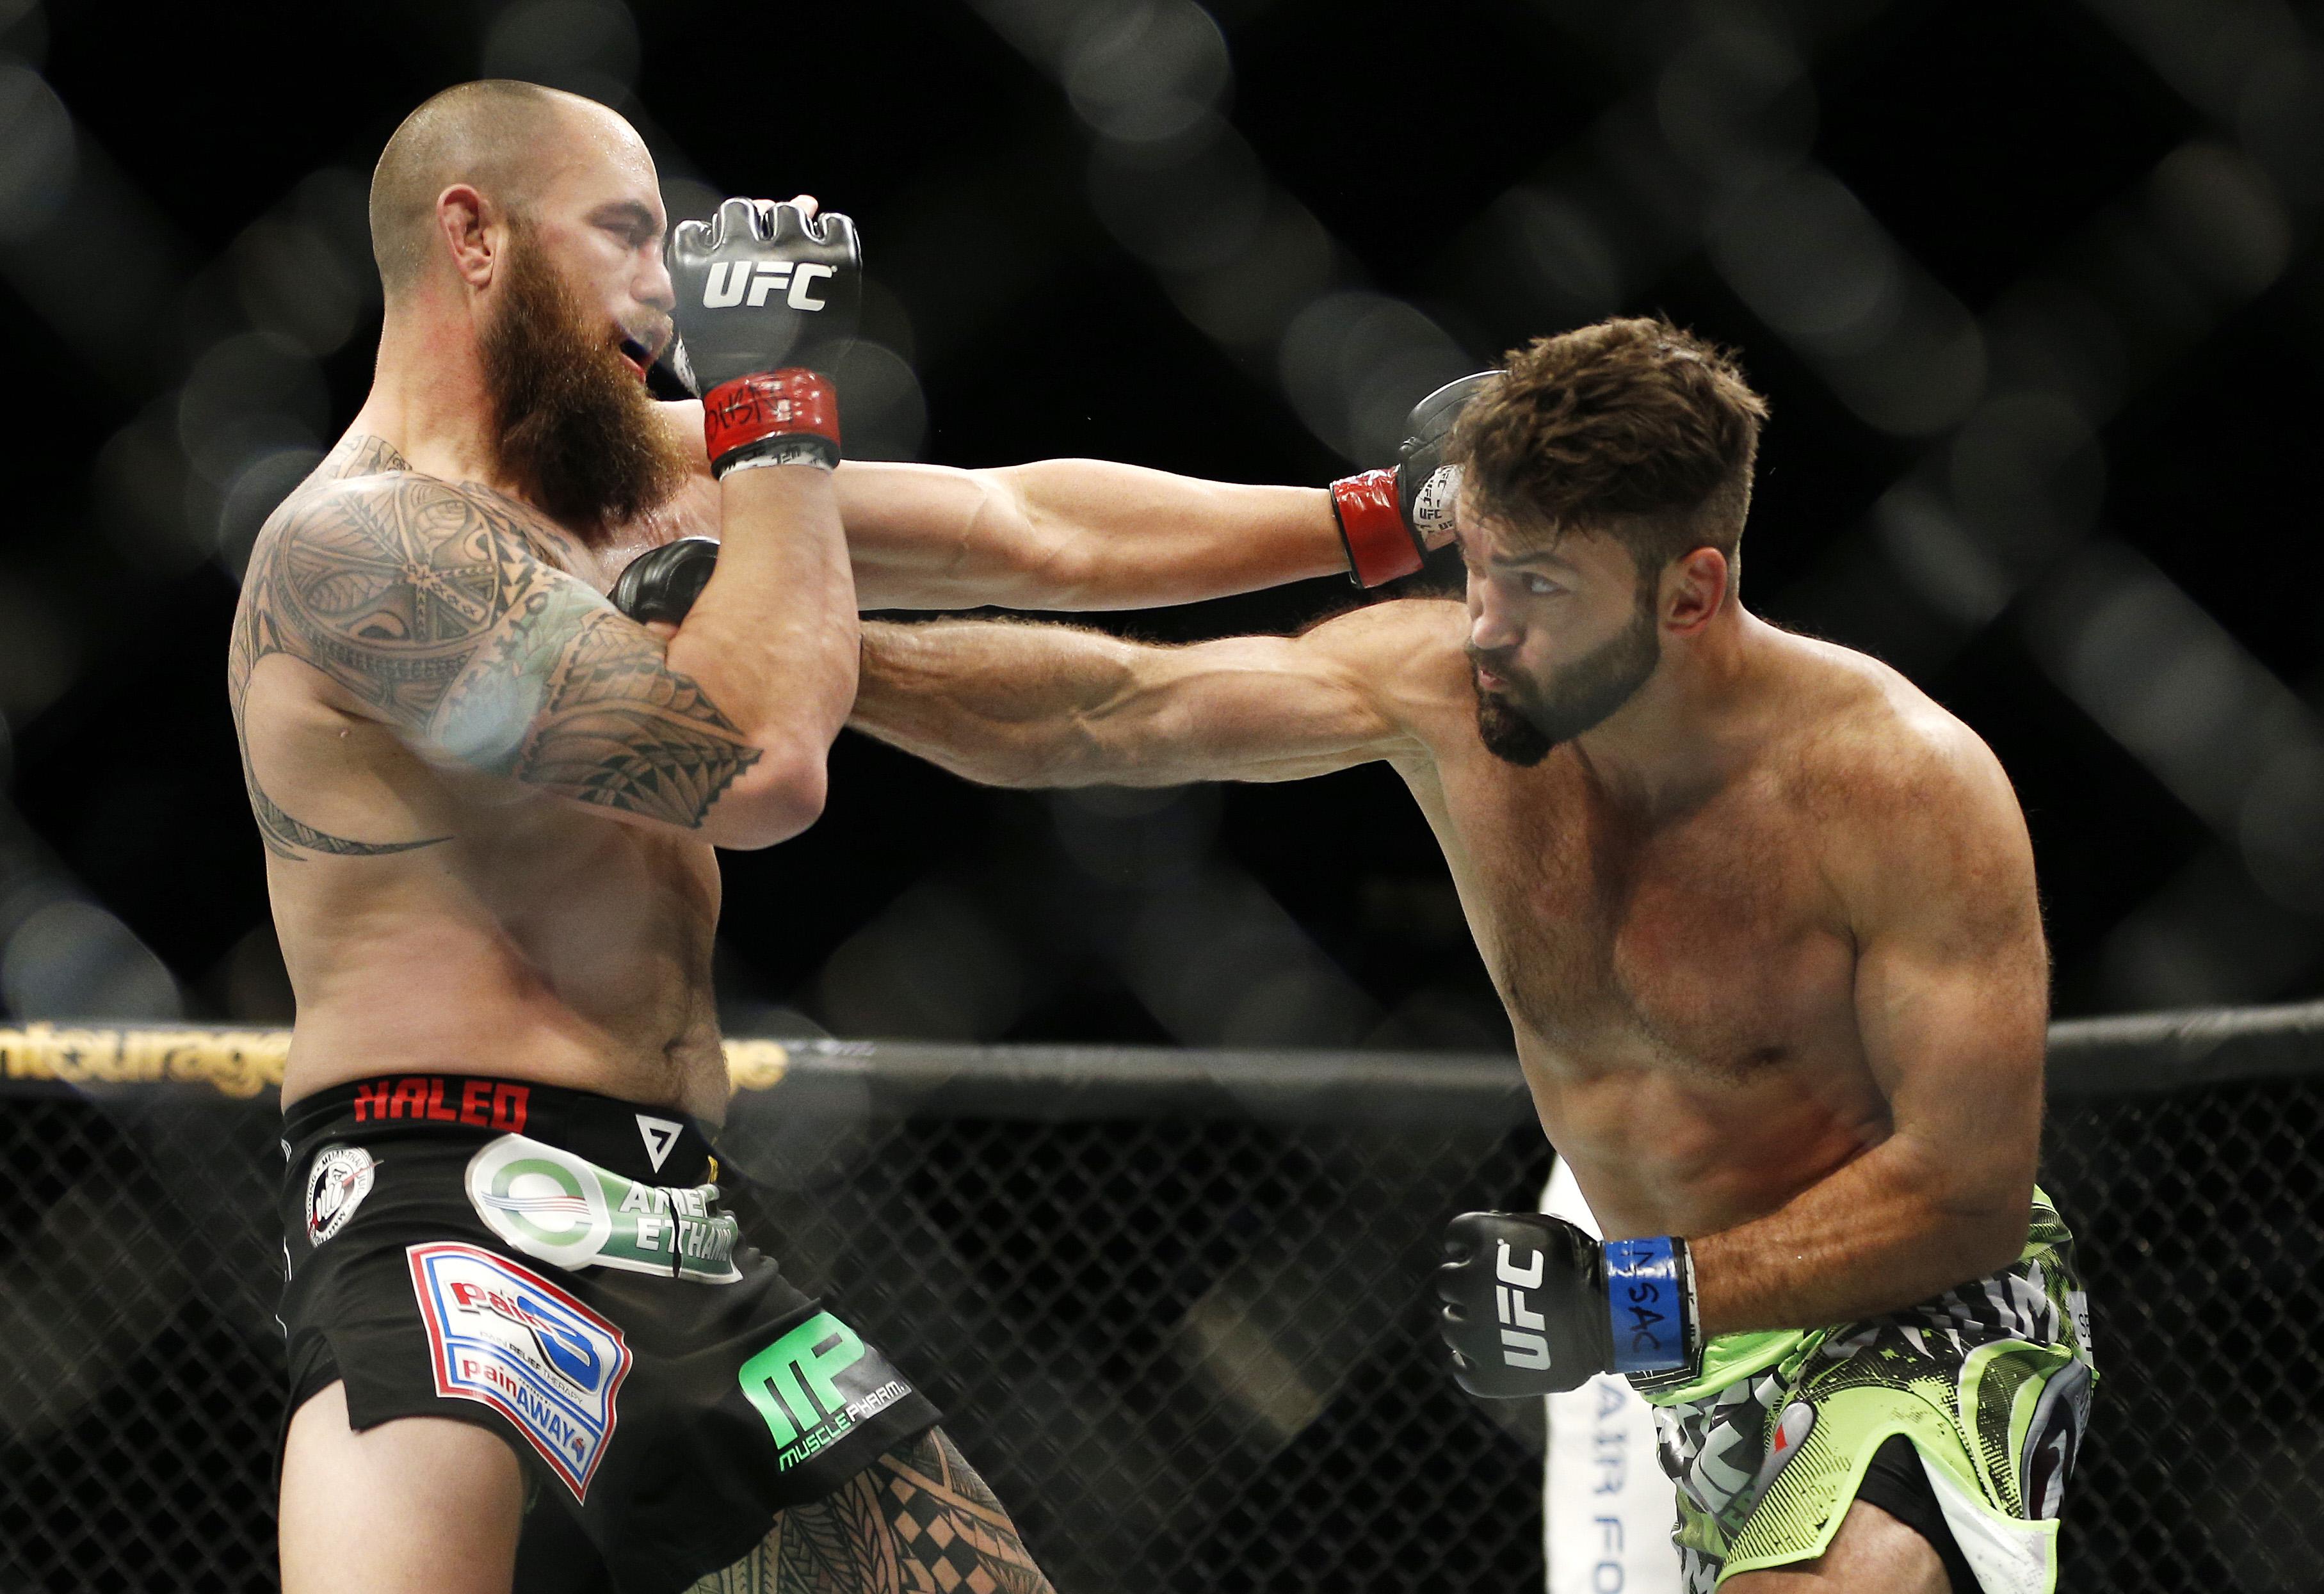 Andrei Arlovski (R) and Travis Browne trade blows at UFC 187. (AP)